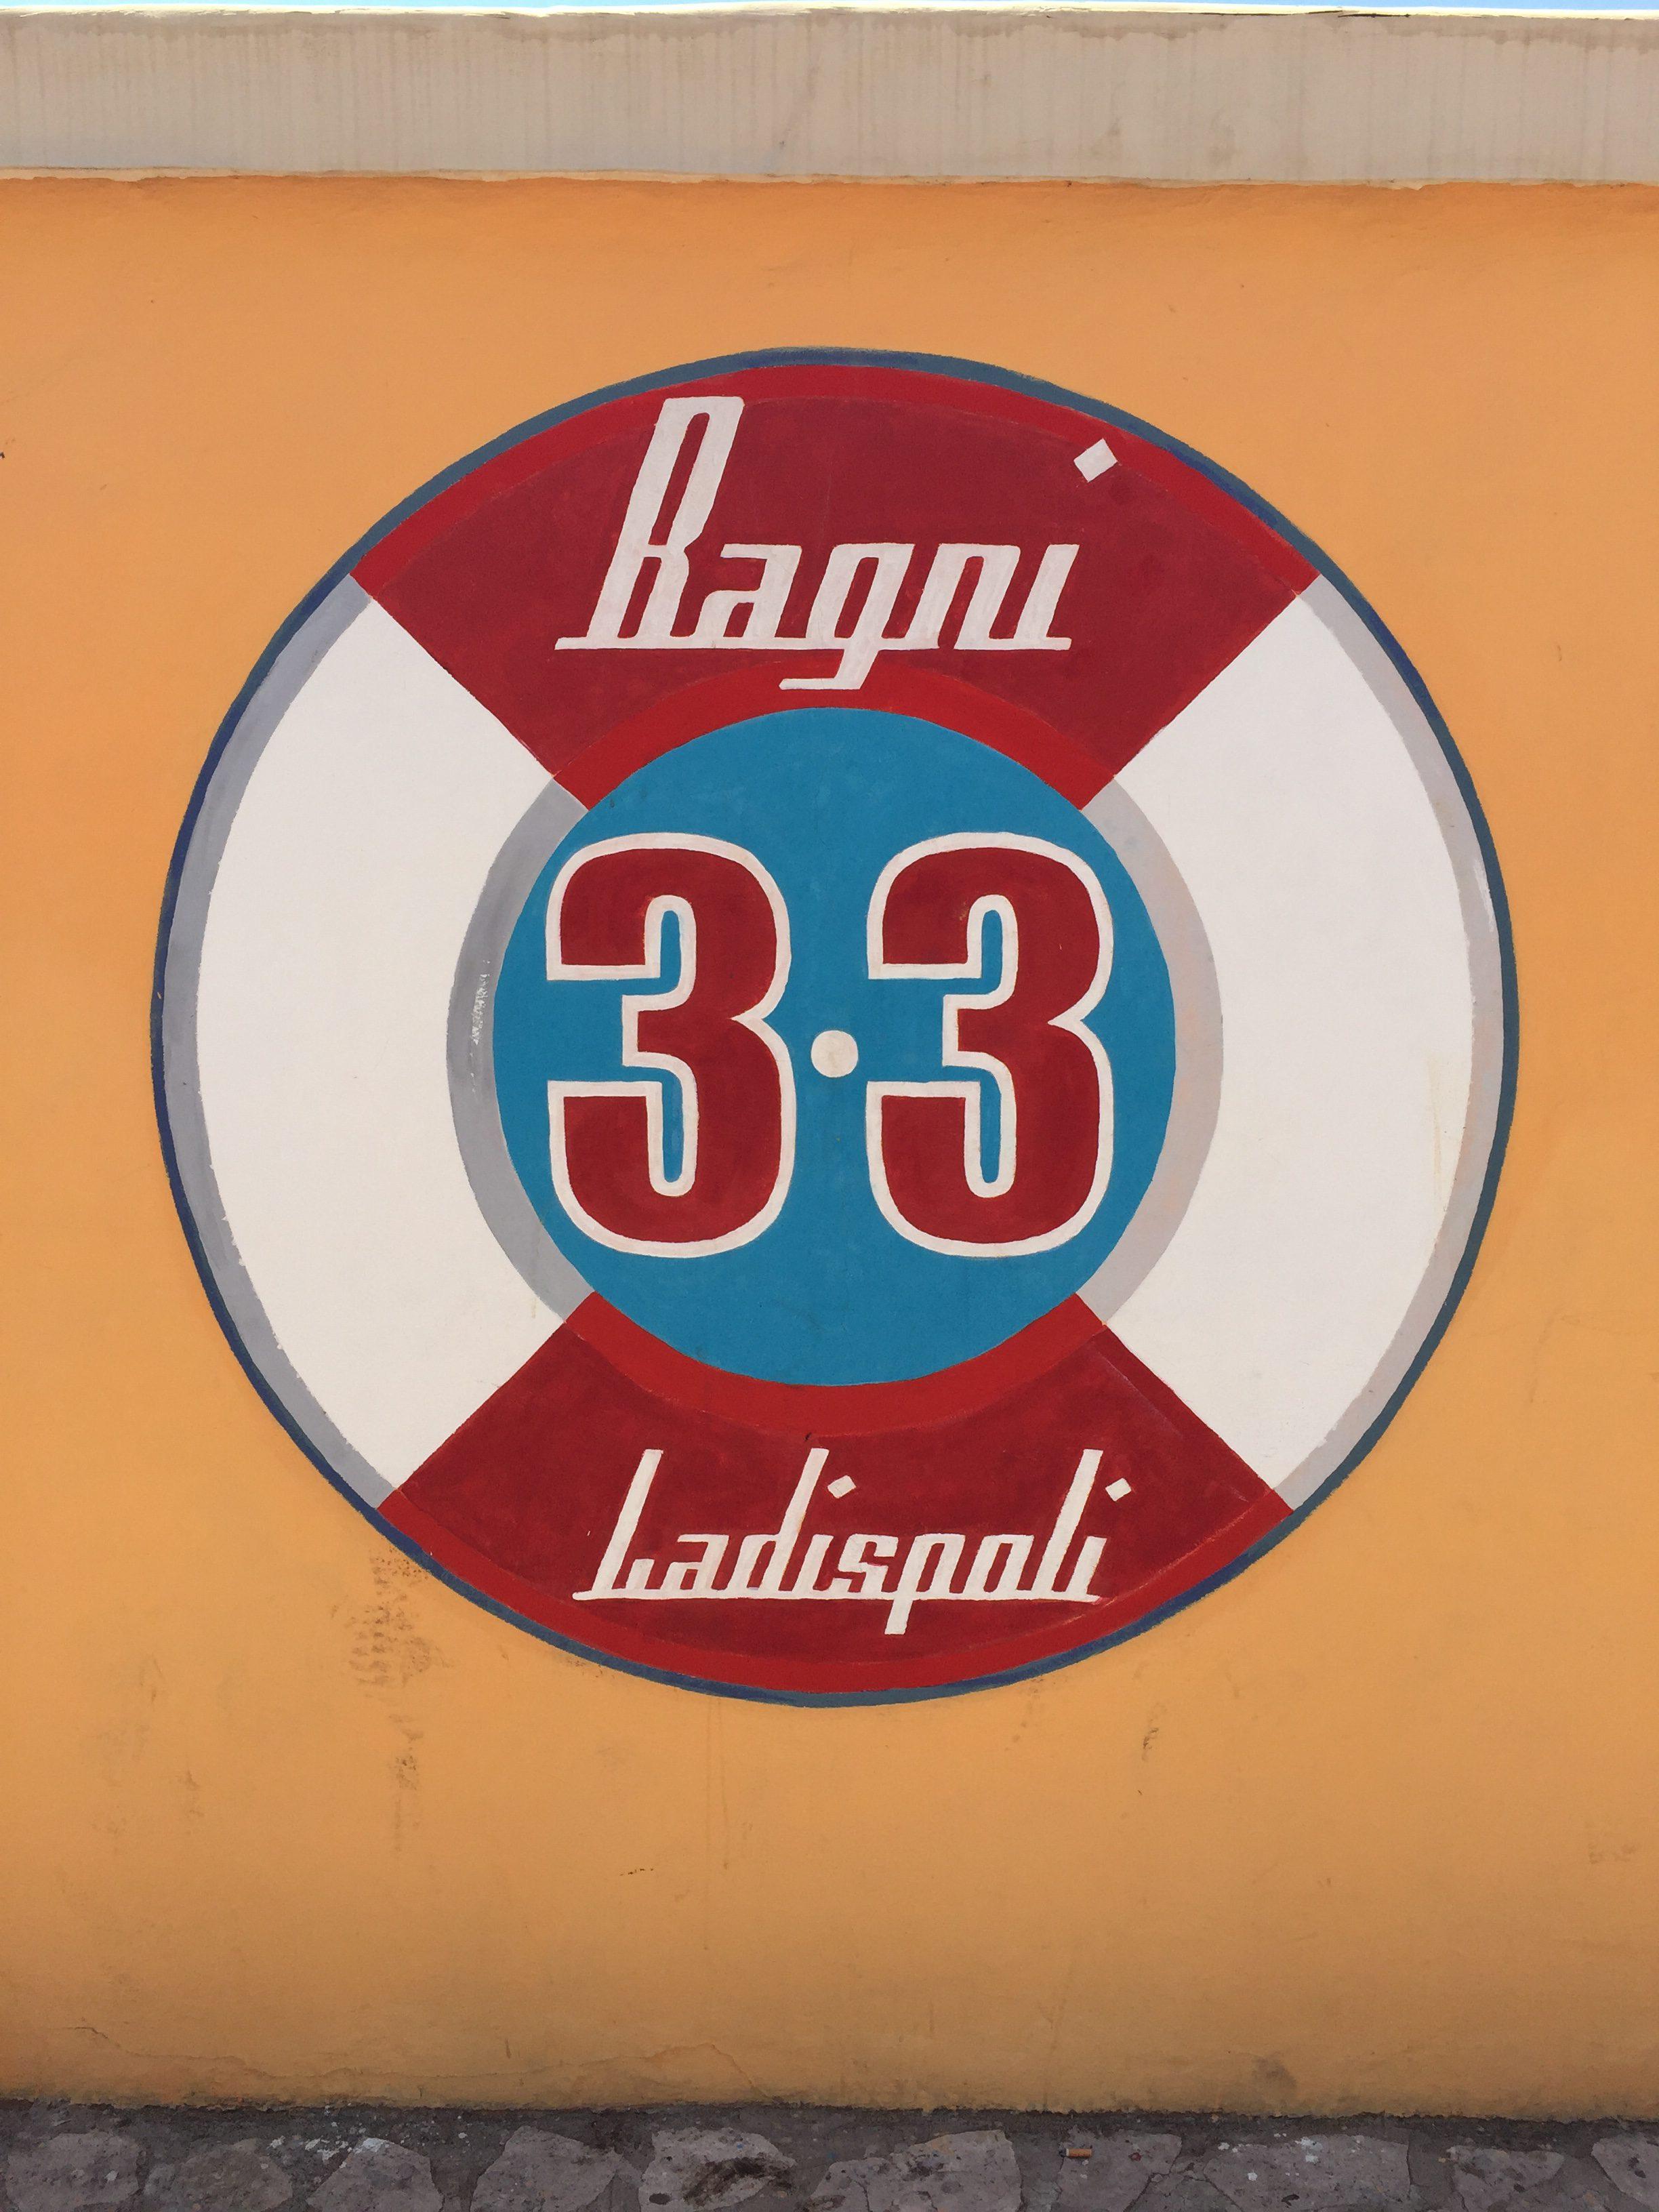 italia ladispoli